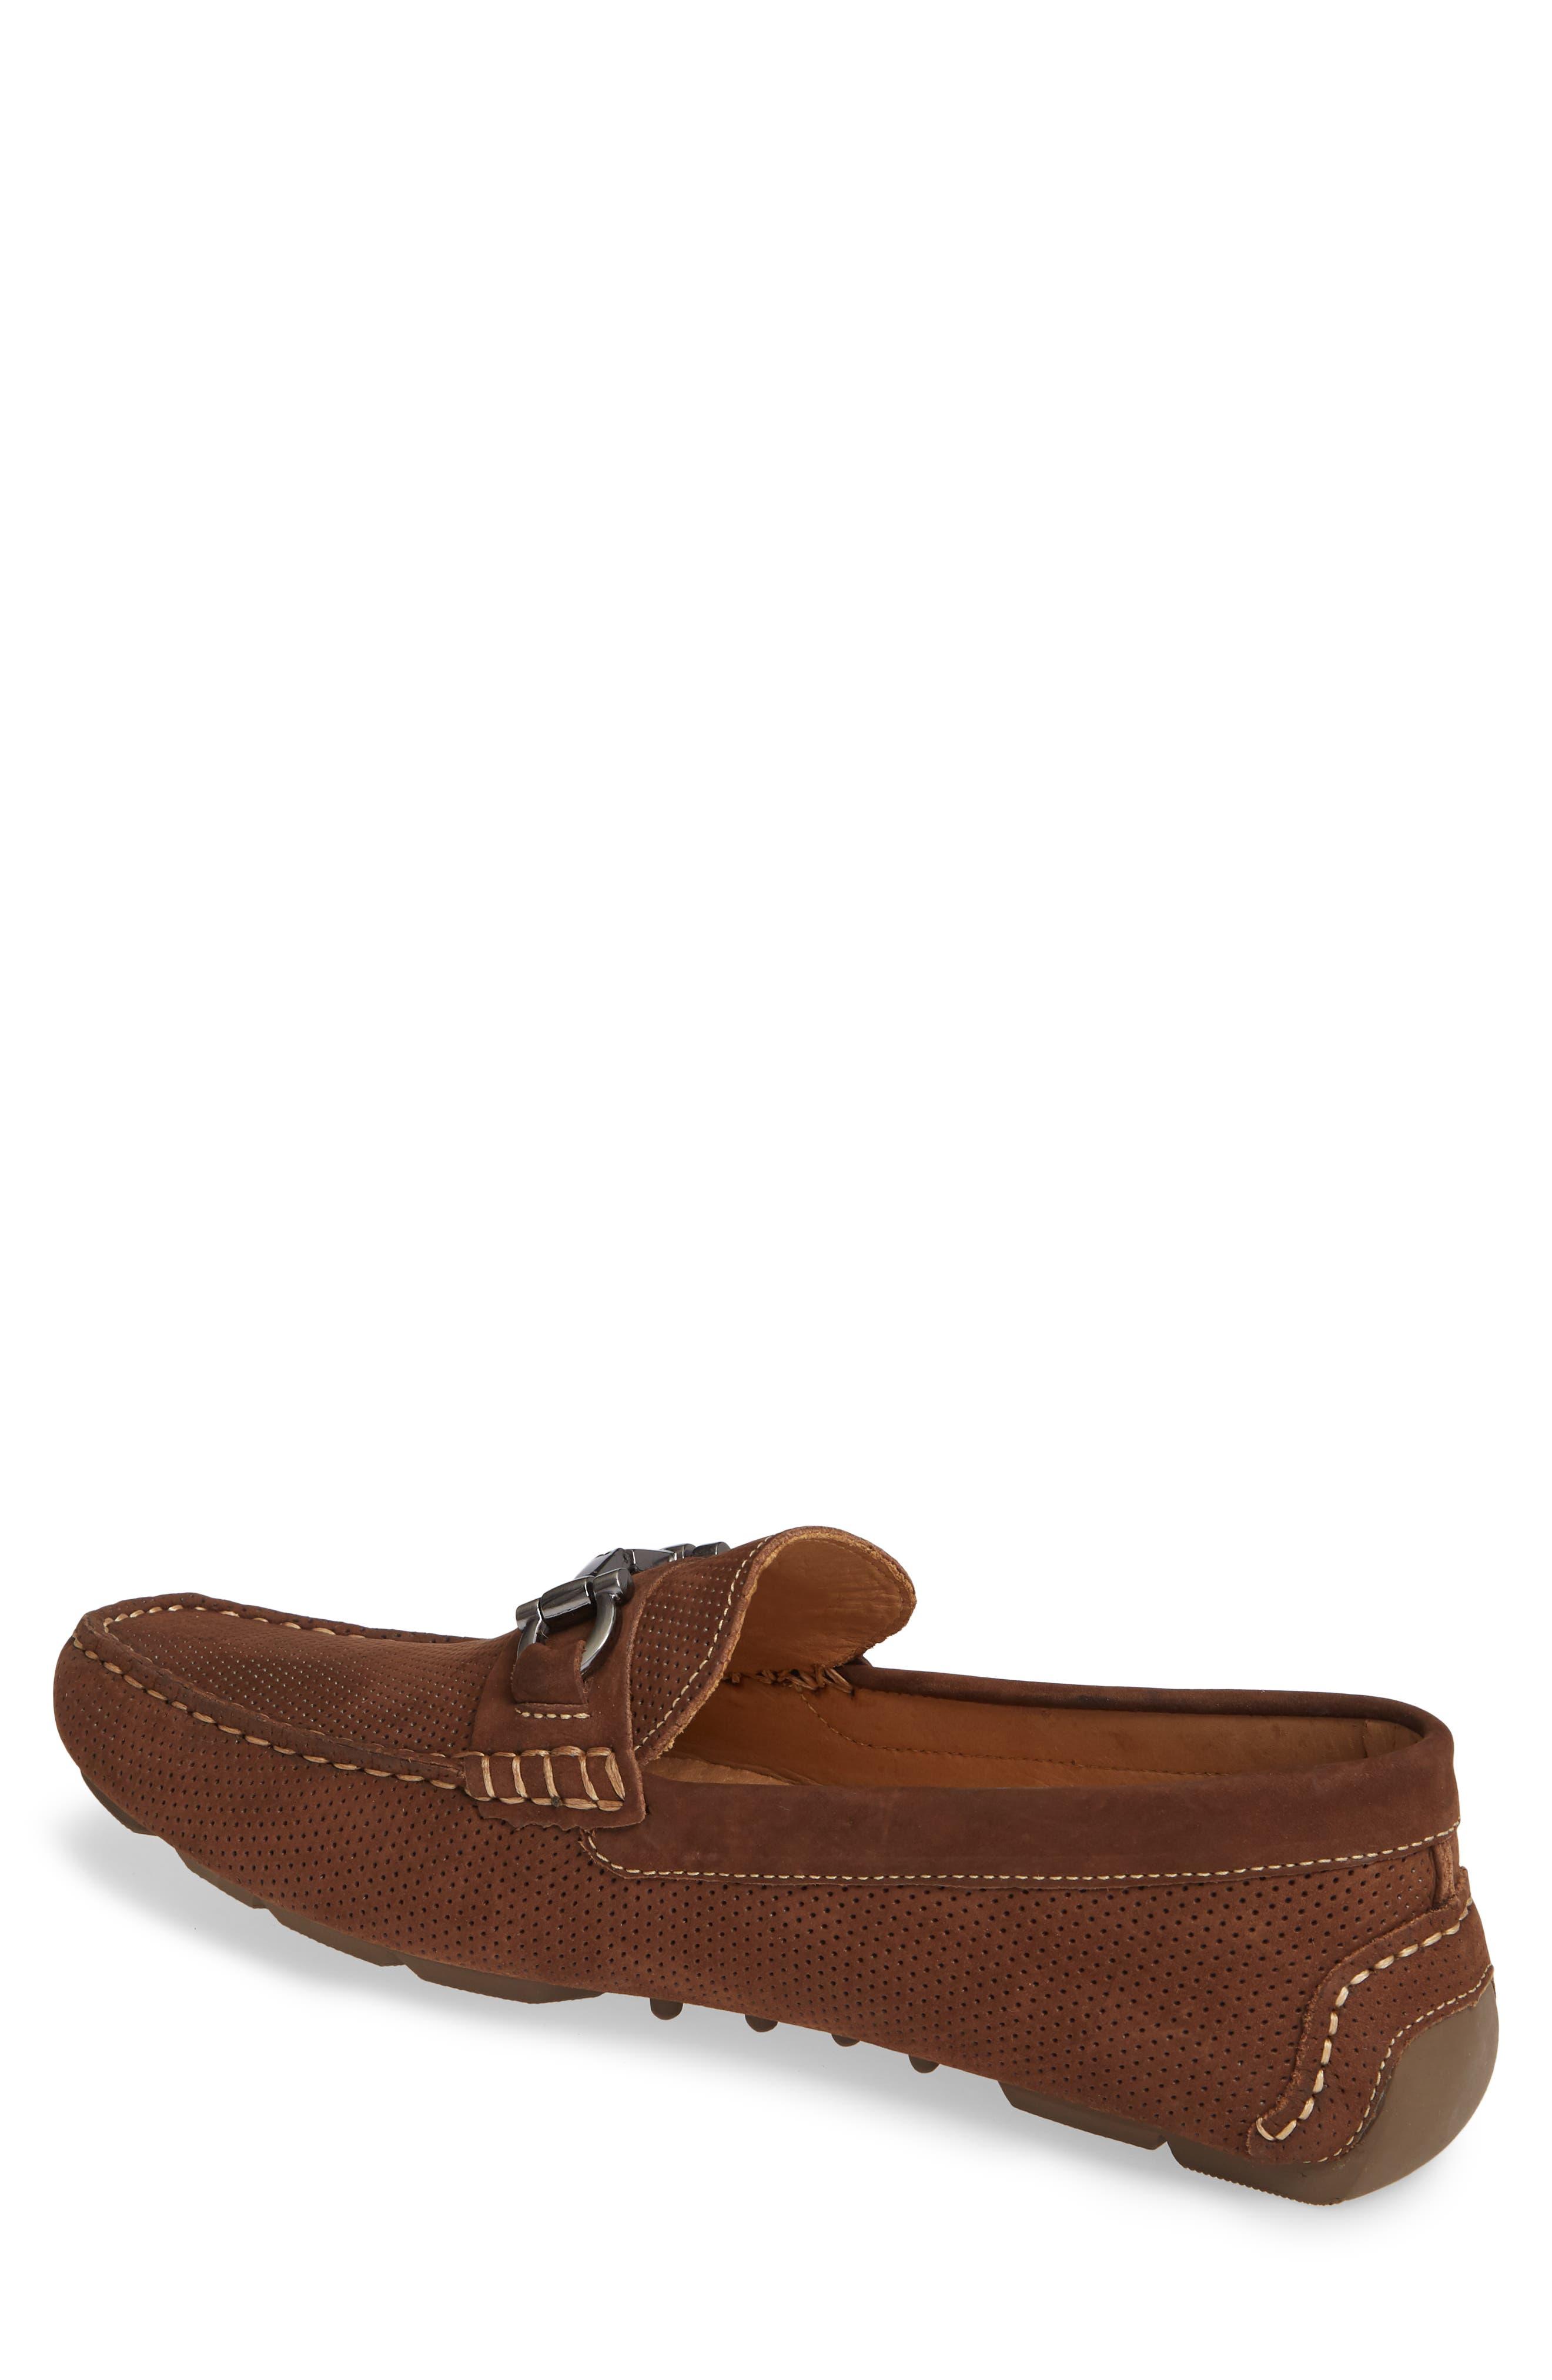 bffef82dd20 Men s 1901 Loafers   Slip-Ons